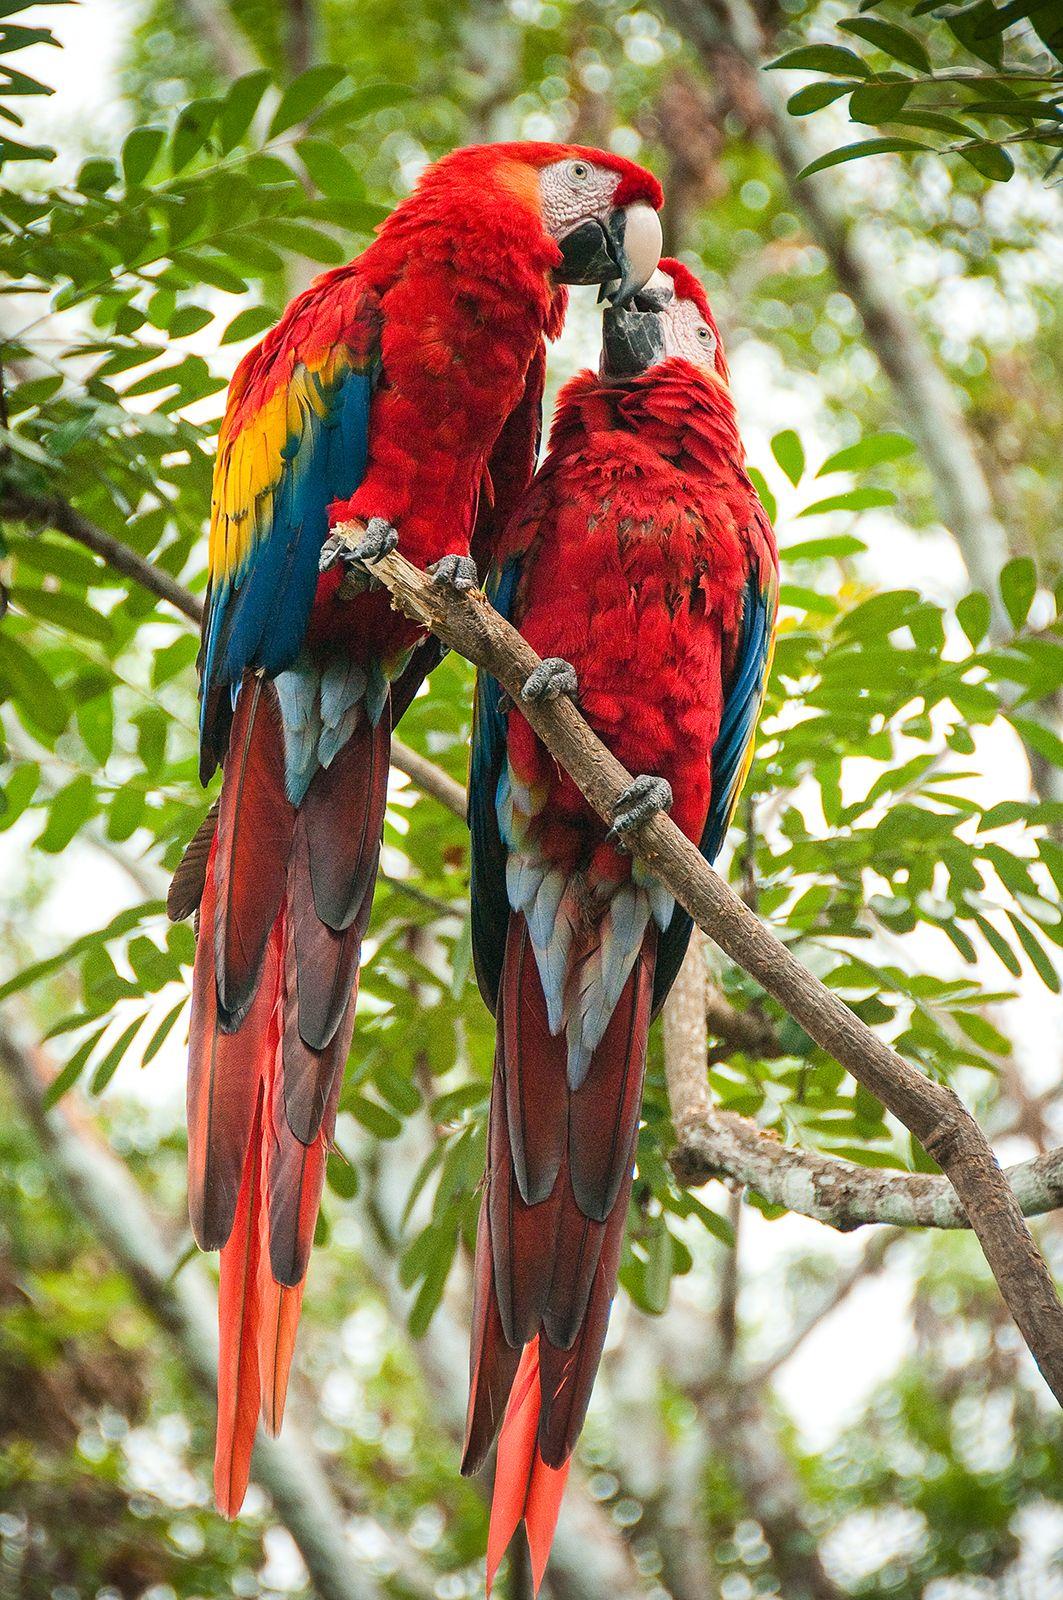 Travel El Peten And Ecotourism A Guatemalan Success Story Estacion Biologica Las Guacamayas Is Home To A Scarlet Ma Ecotourism Parrot Central America Travel